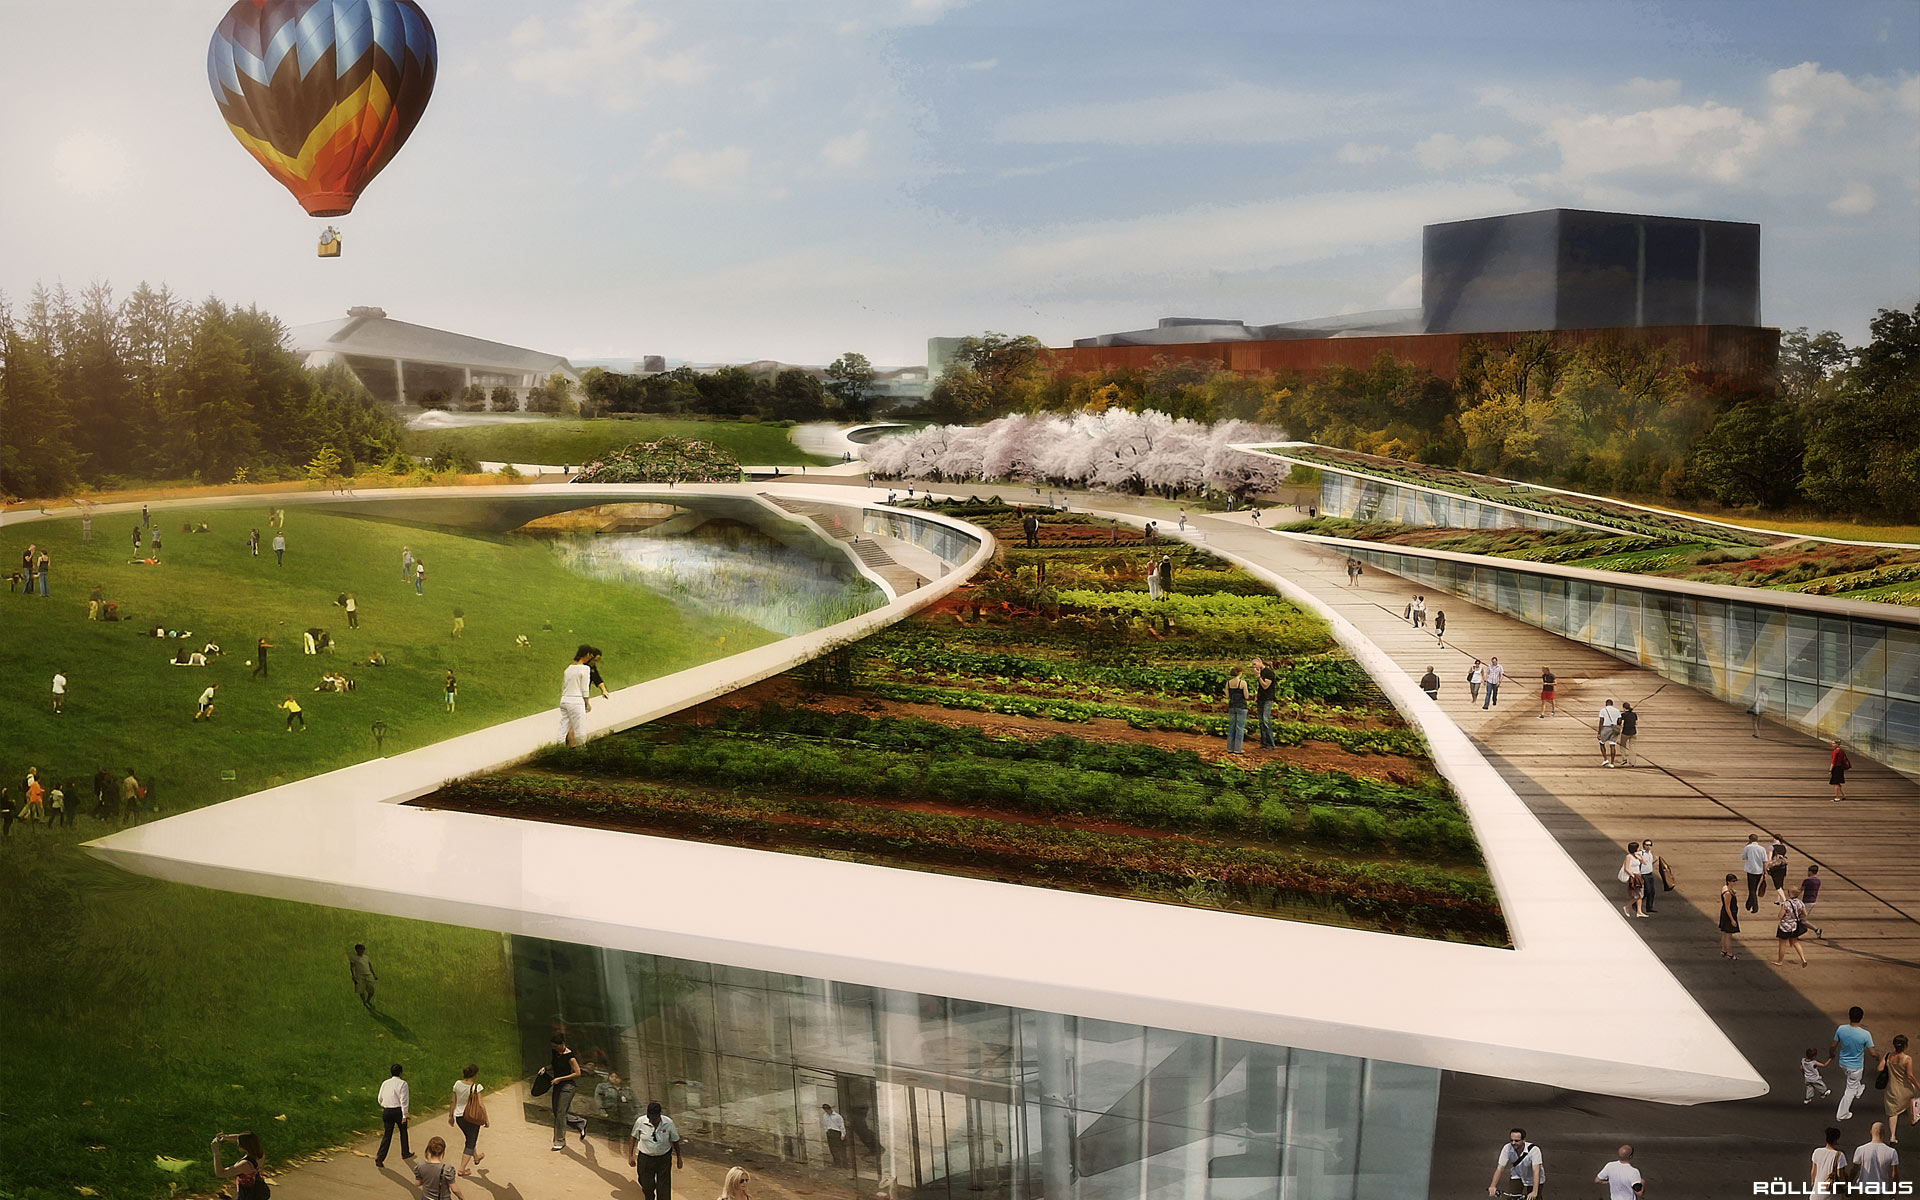 Seattle Center Memorial Pavilion & Gardens by Rollerhaüs